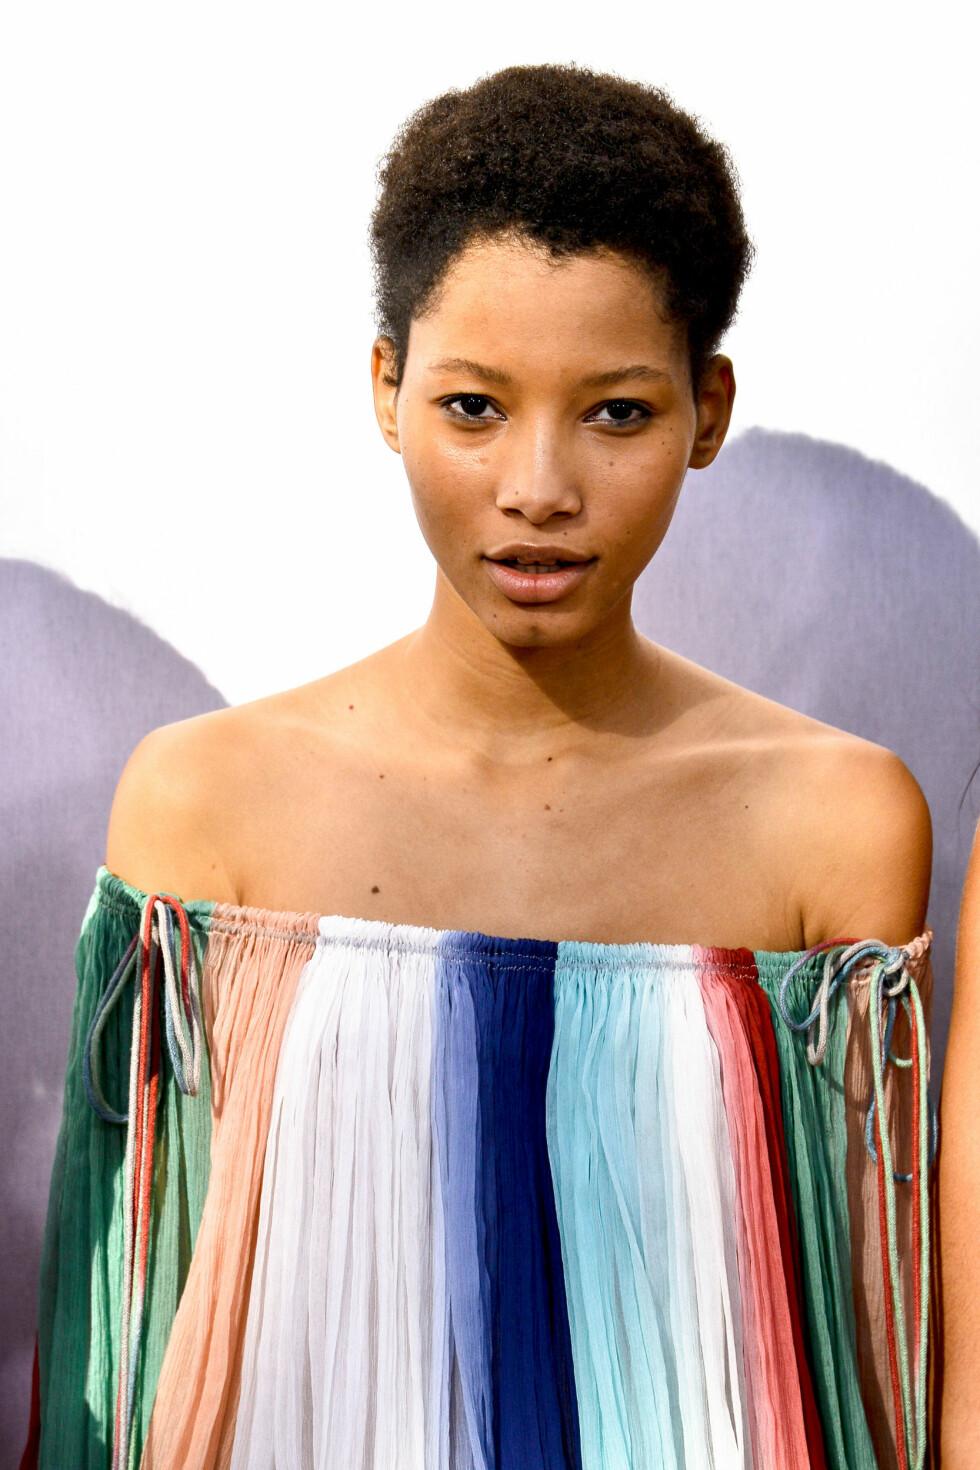 Chloe SS16 Foto: Zuma Press